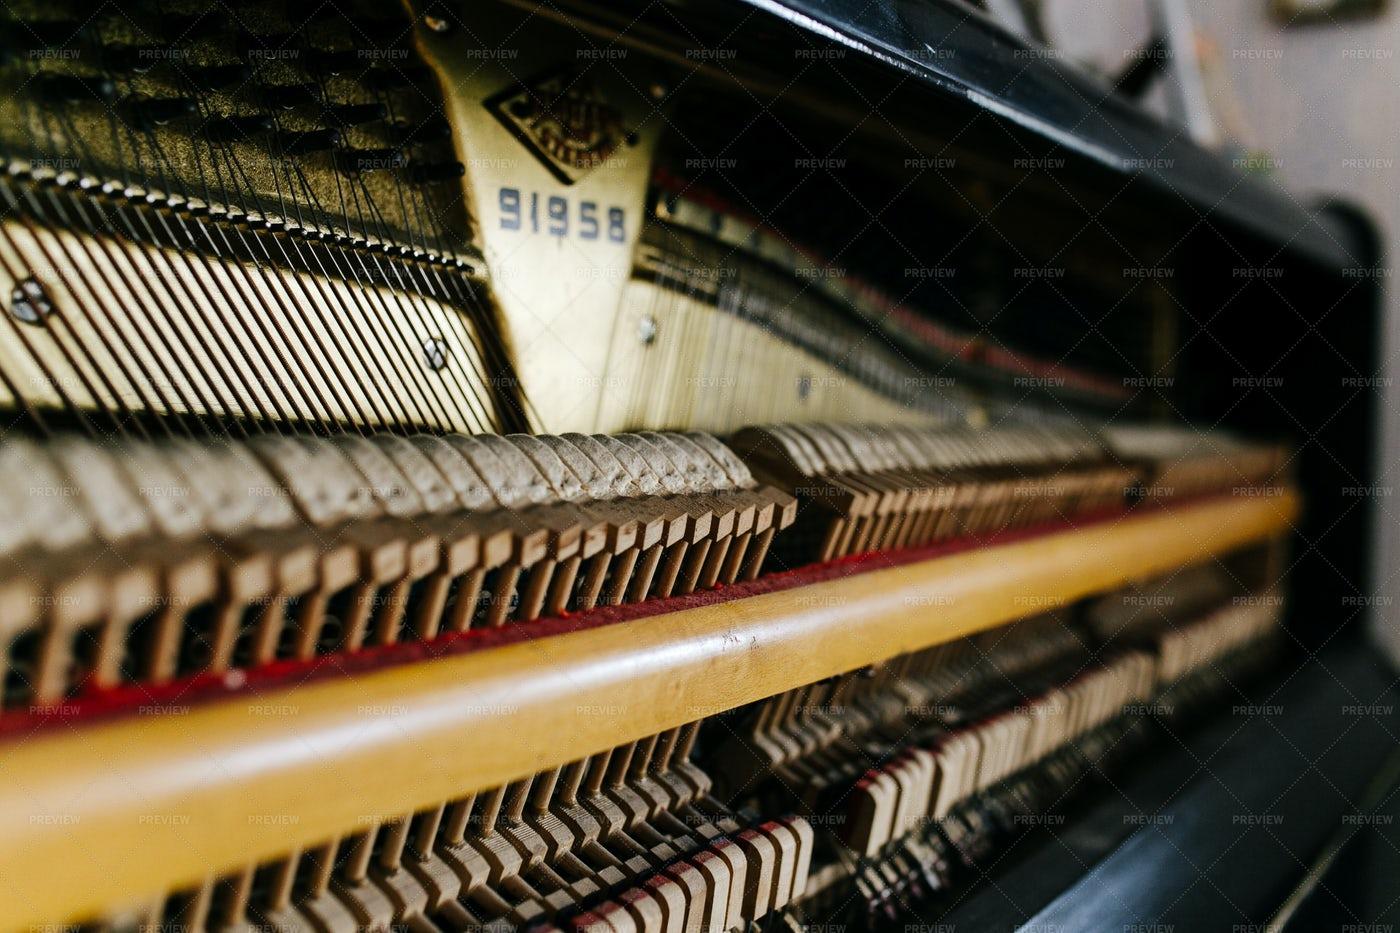 Interior Of Vintage Upright Piano: Stock Photos